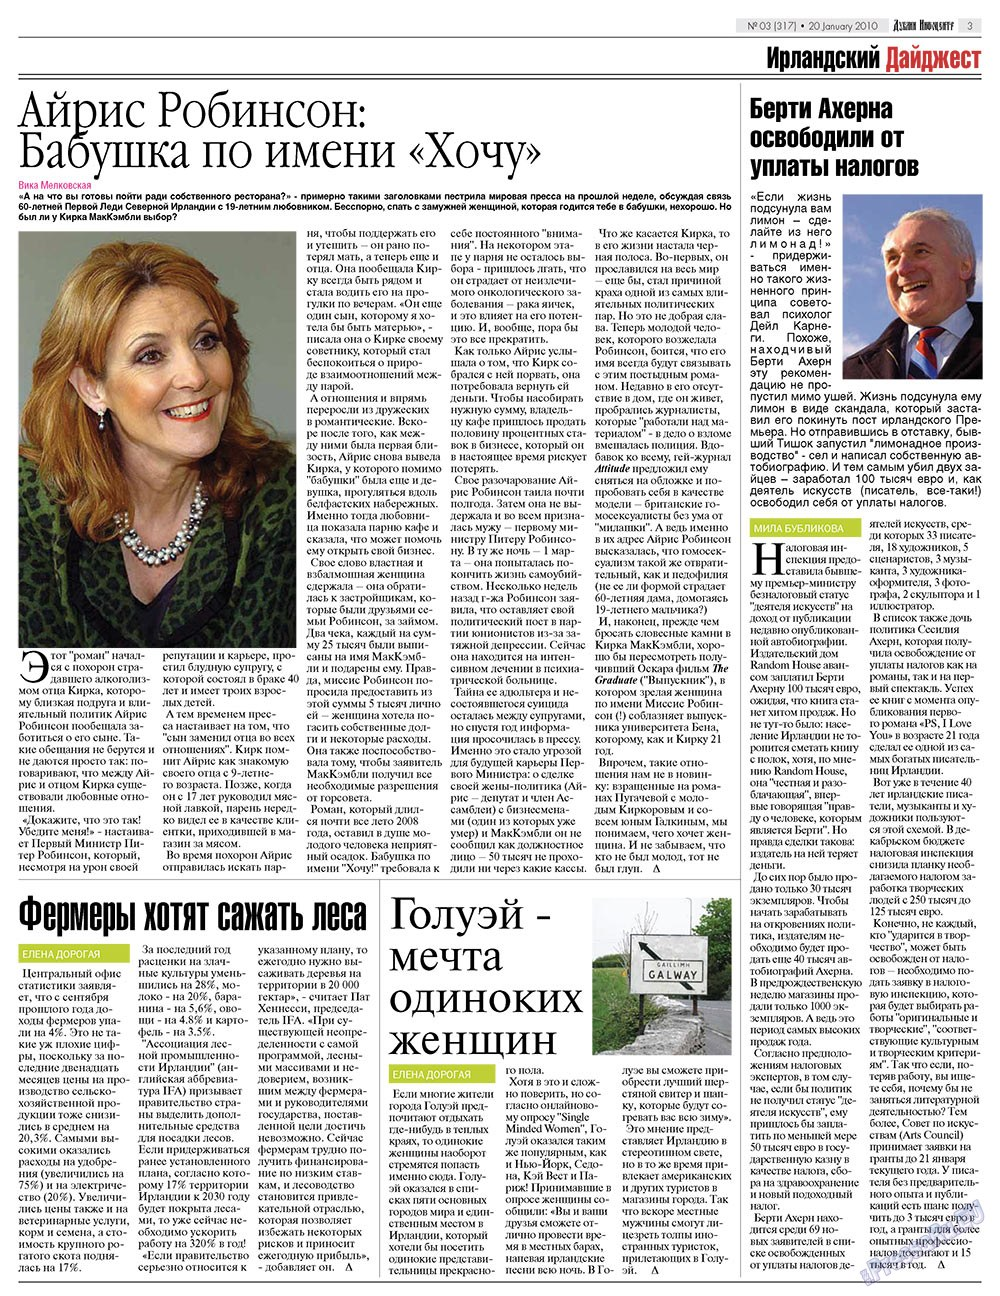 Дублин инфоцентр (газета). 2010 год, номер 3, стр. 3